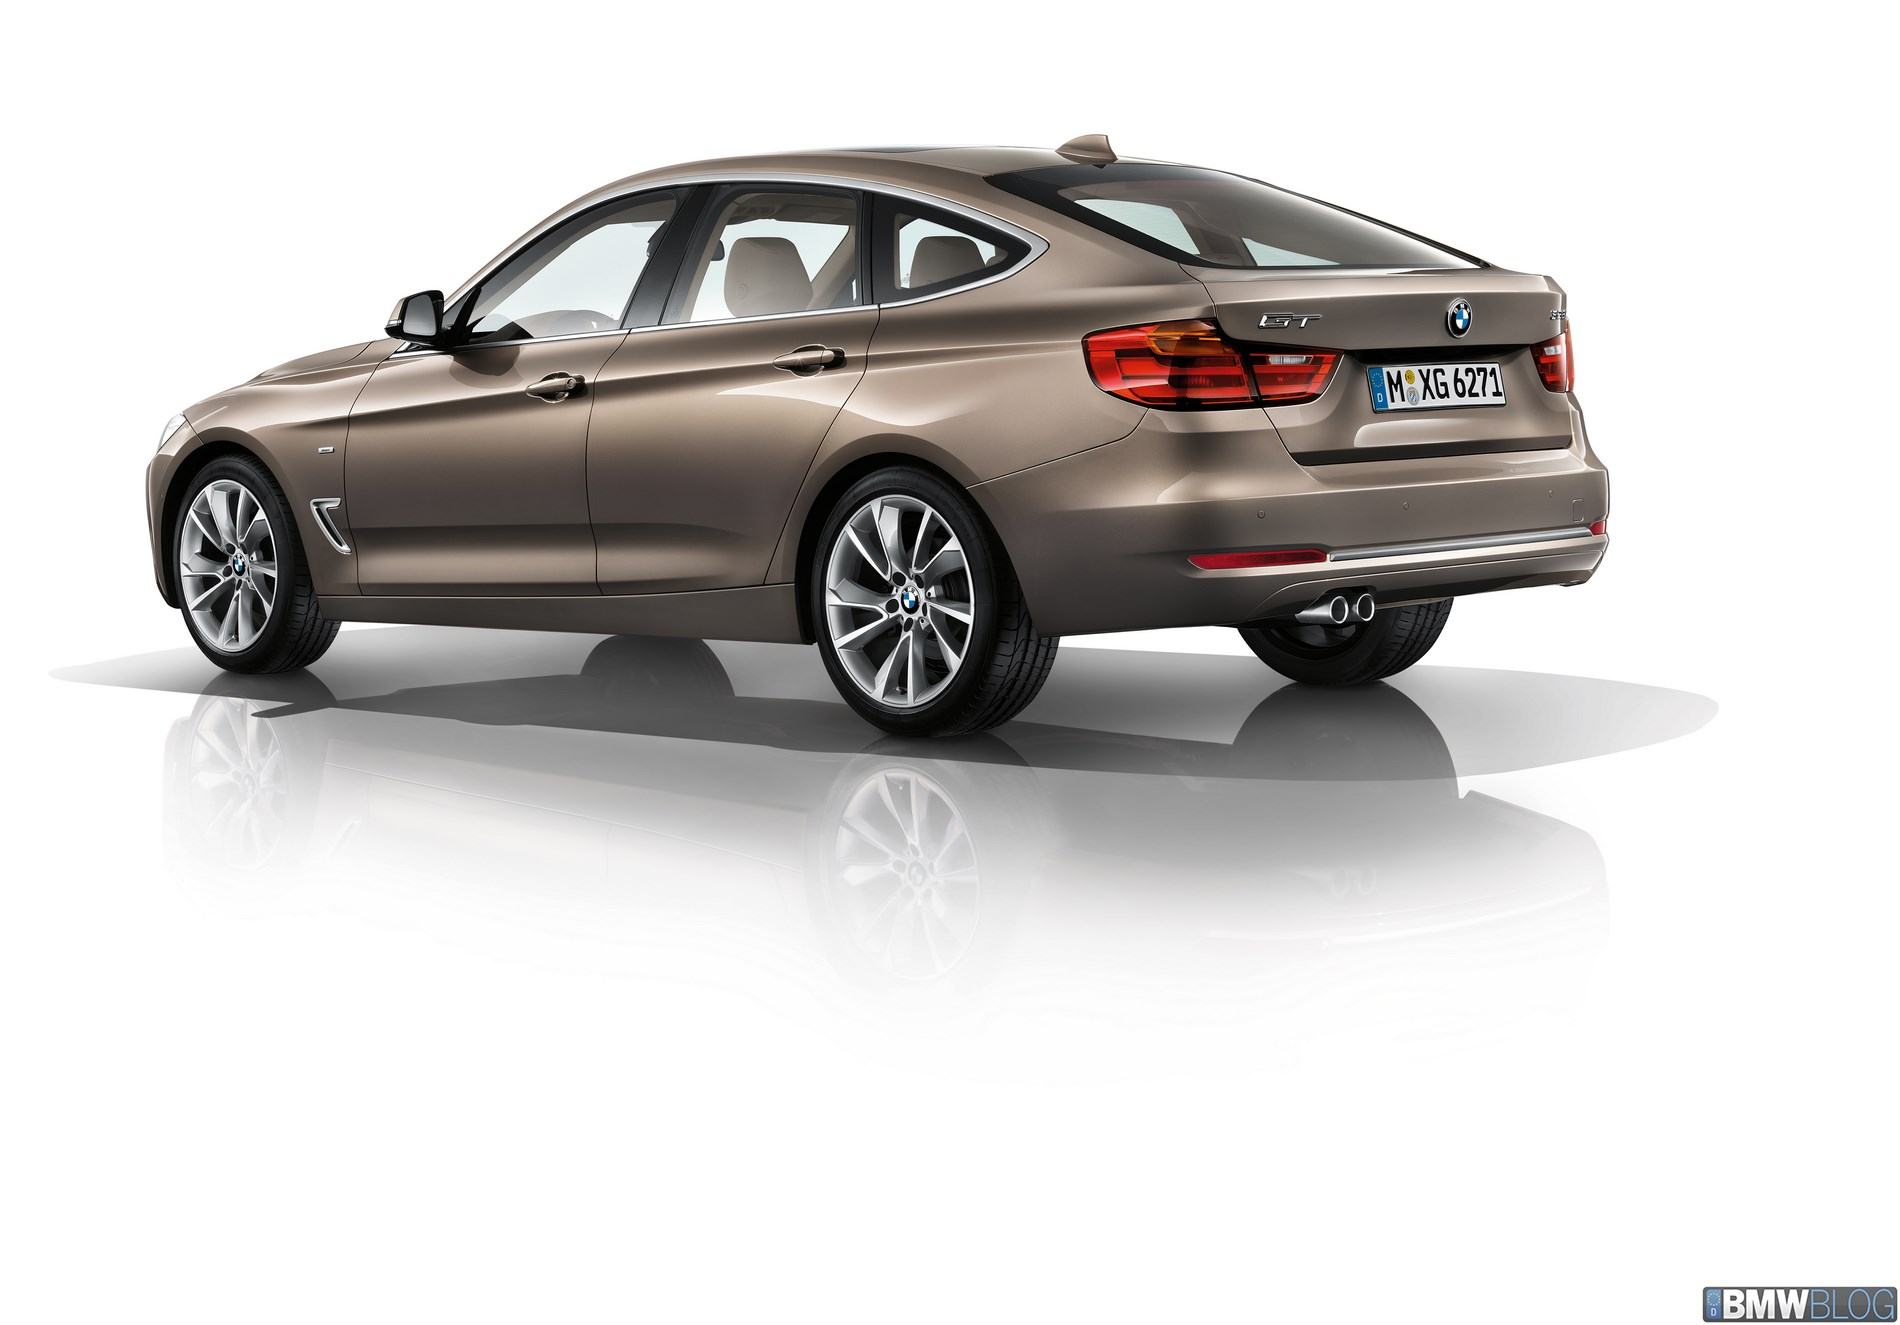 2013 - [BMW] Série 3 GT [F34] - Page 19 Bmw-3-series-gran-turismo-36